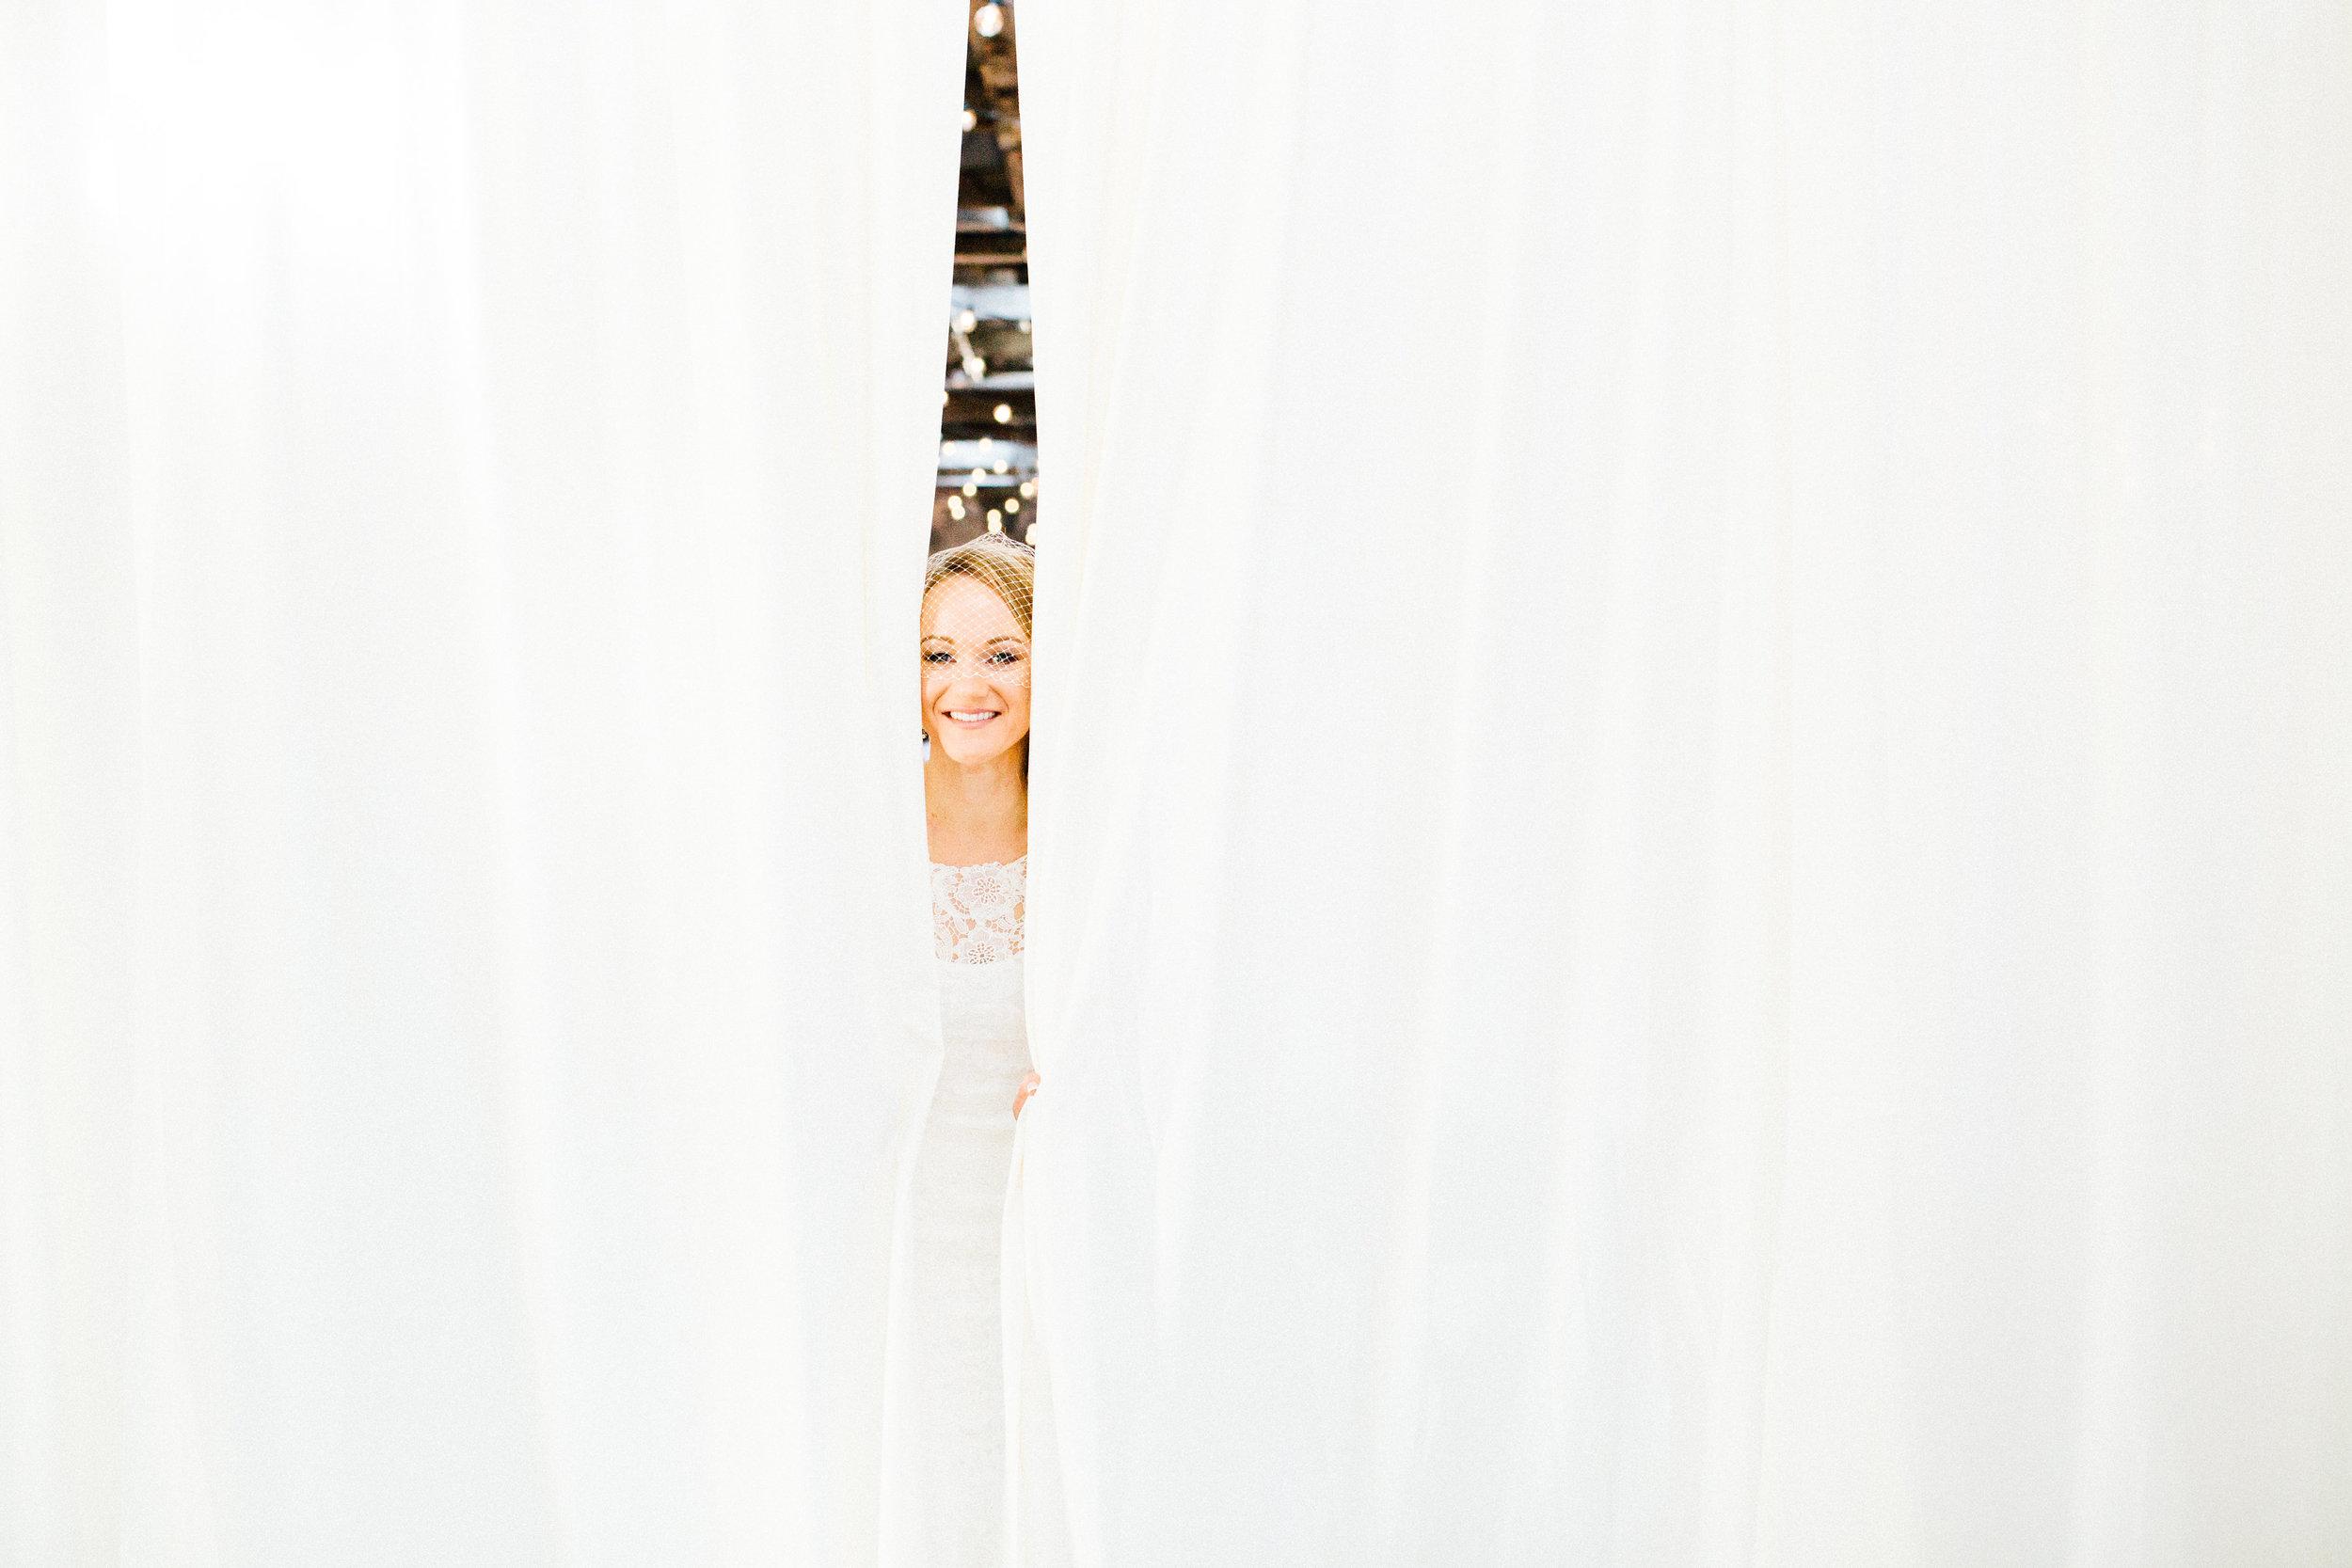 mt-washington-mill-dye-house-wedding-photography-baltimore-maryland-2 (1).jpg